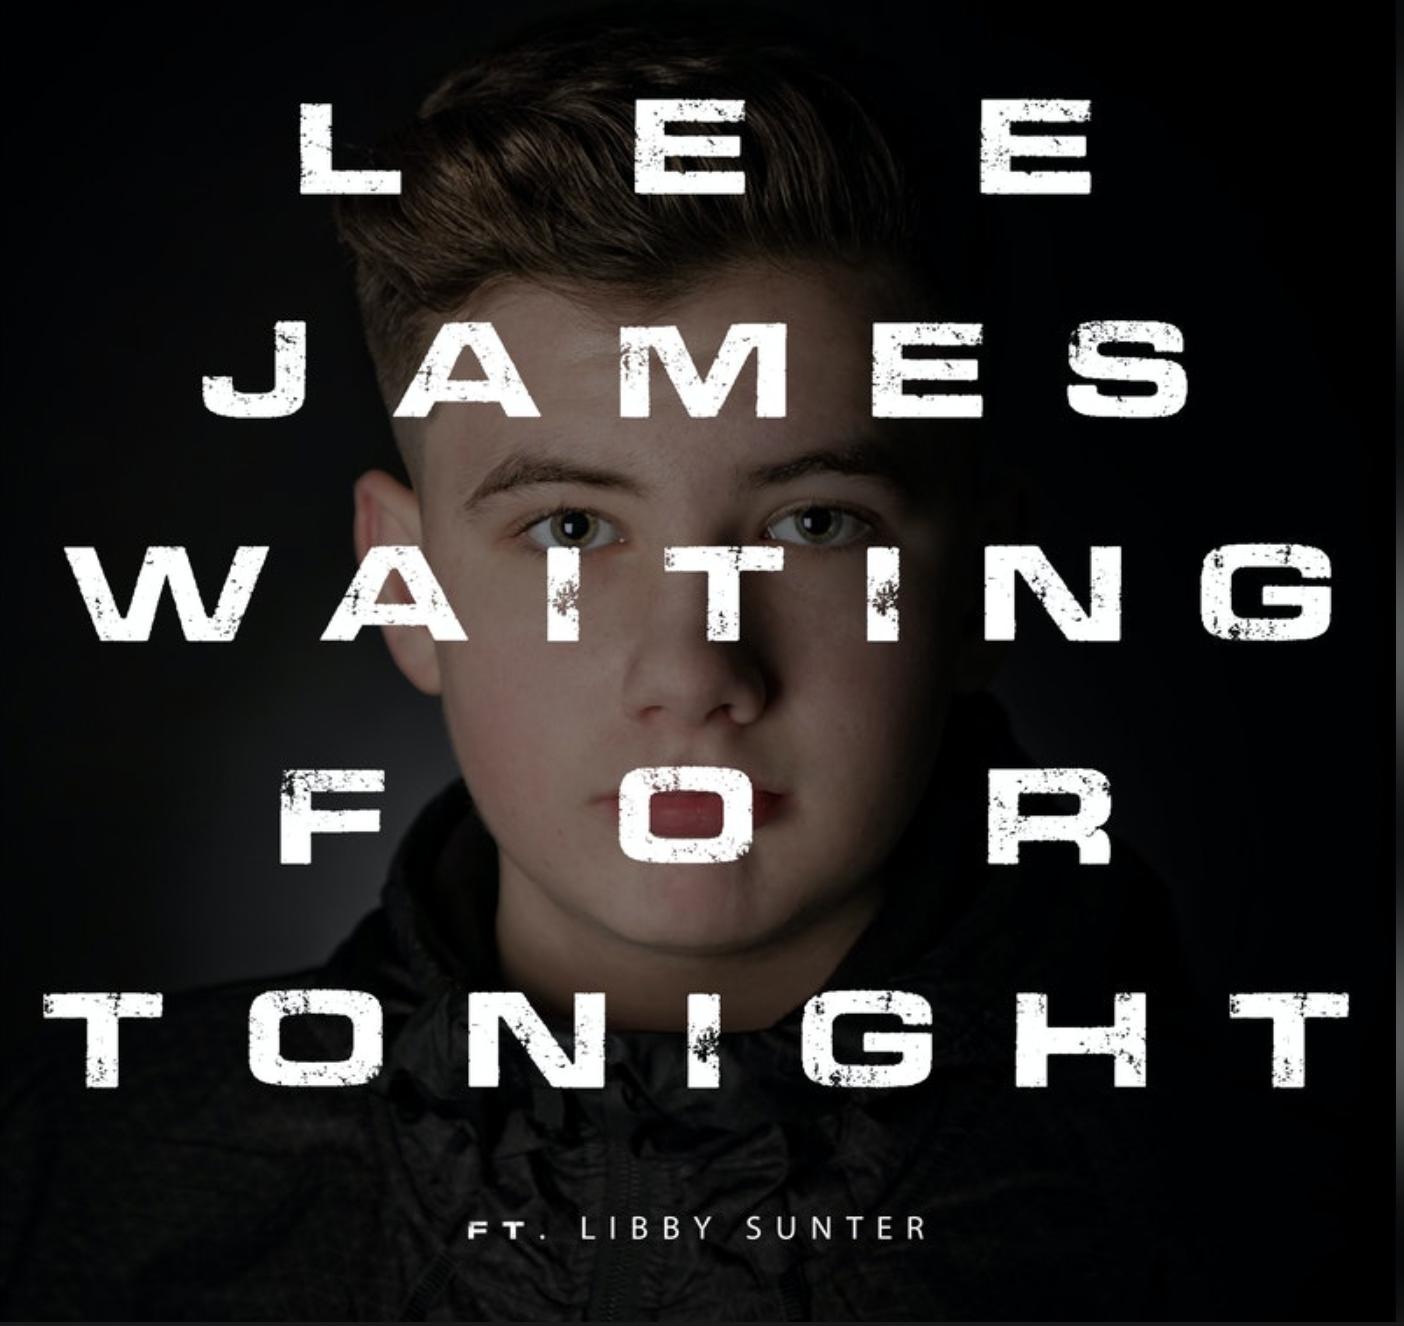 lee james new single